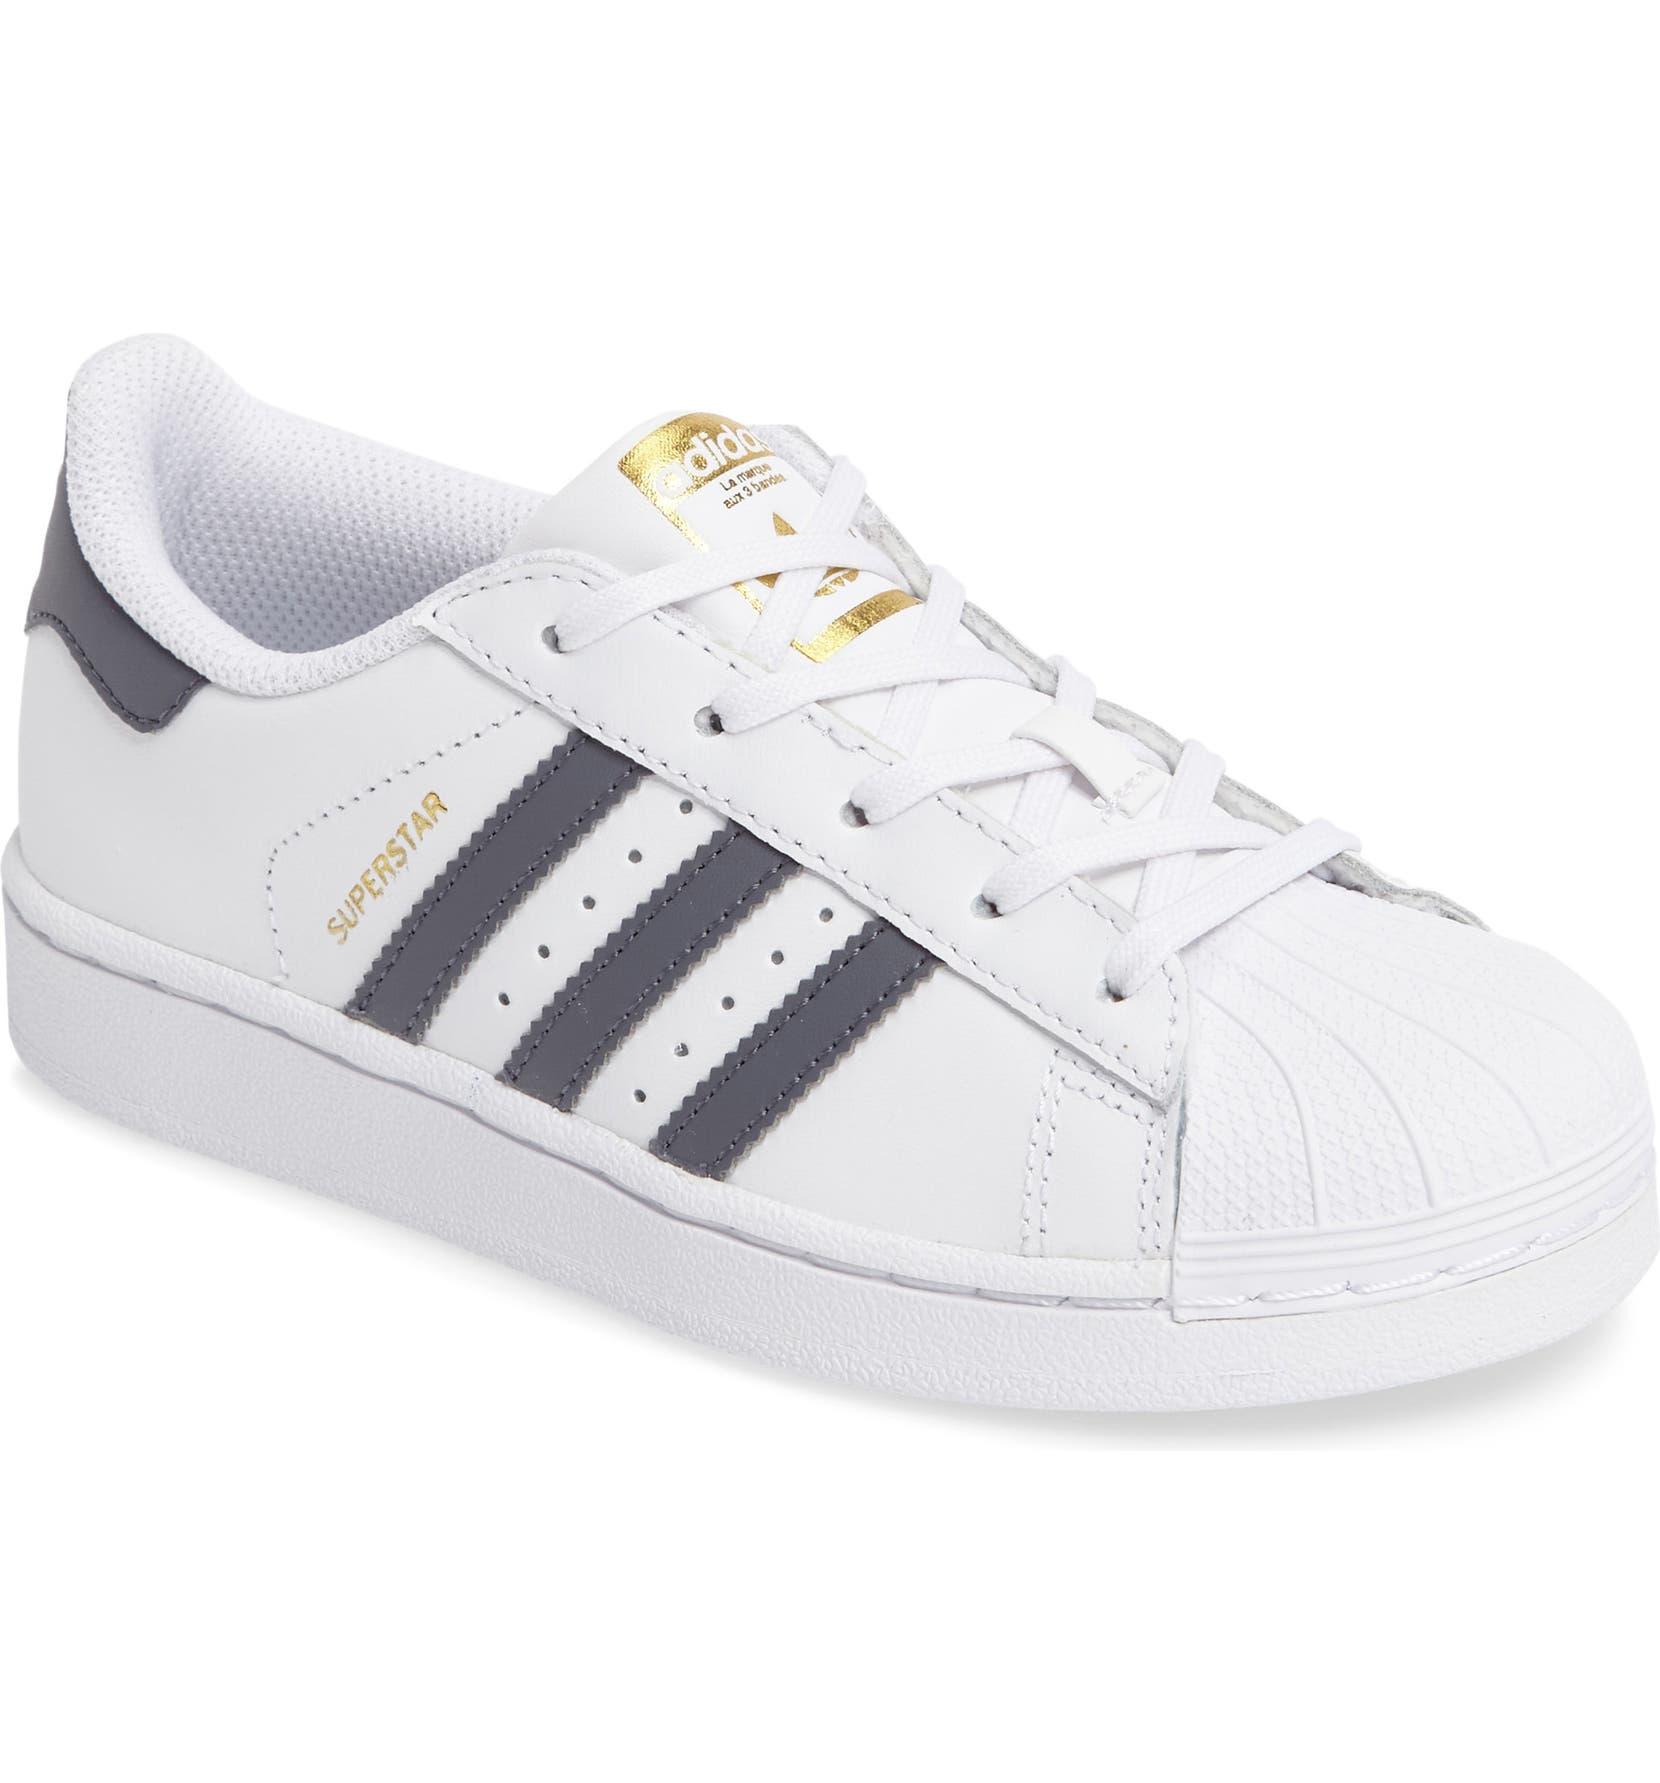 f3e833f7a4b6c6 adidas Superstar - Foundation Sneaker (Toddler   Little Kid)